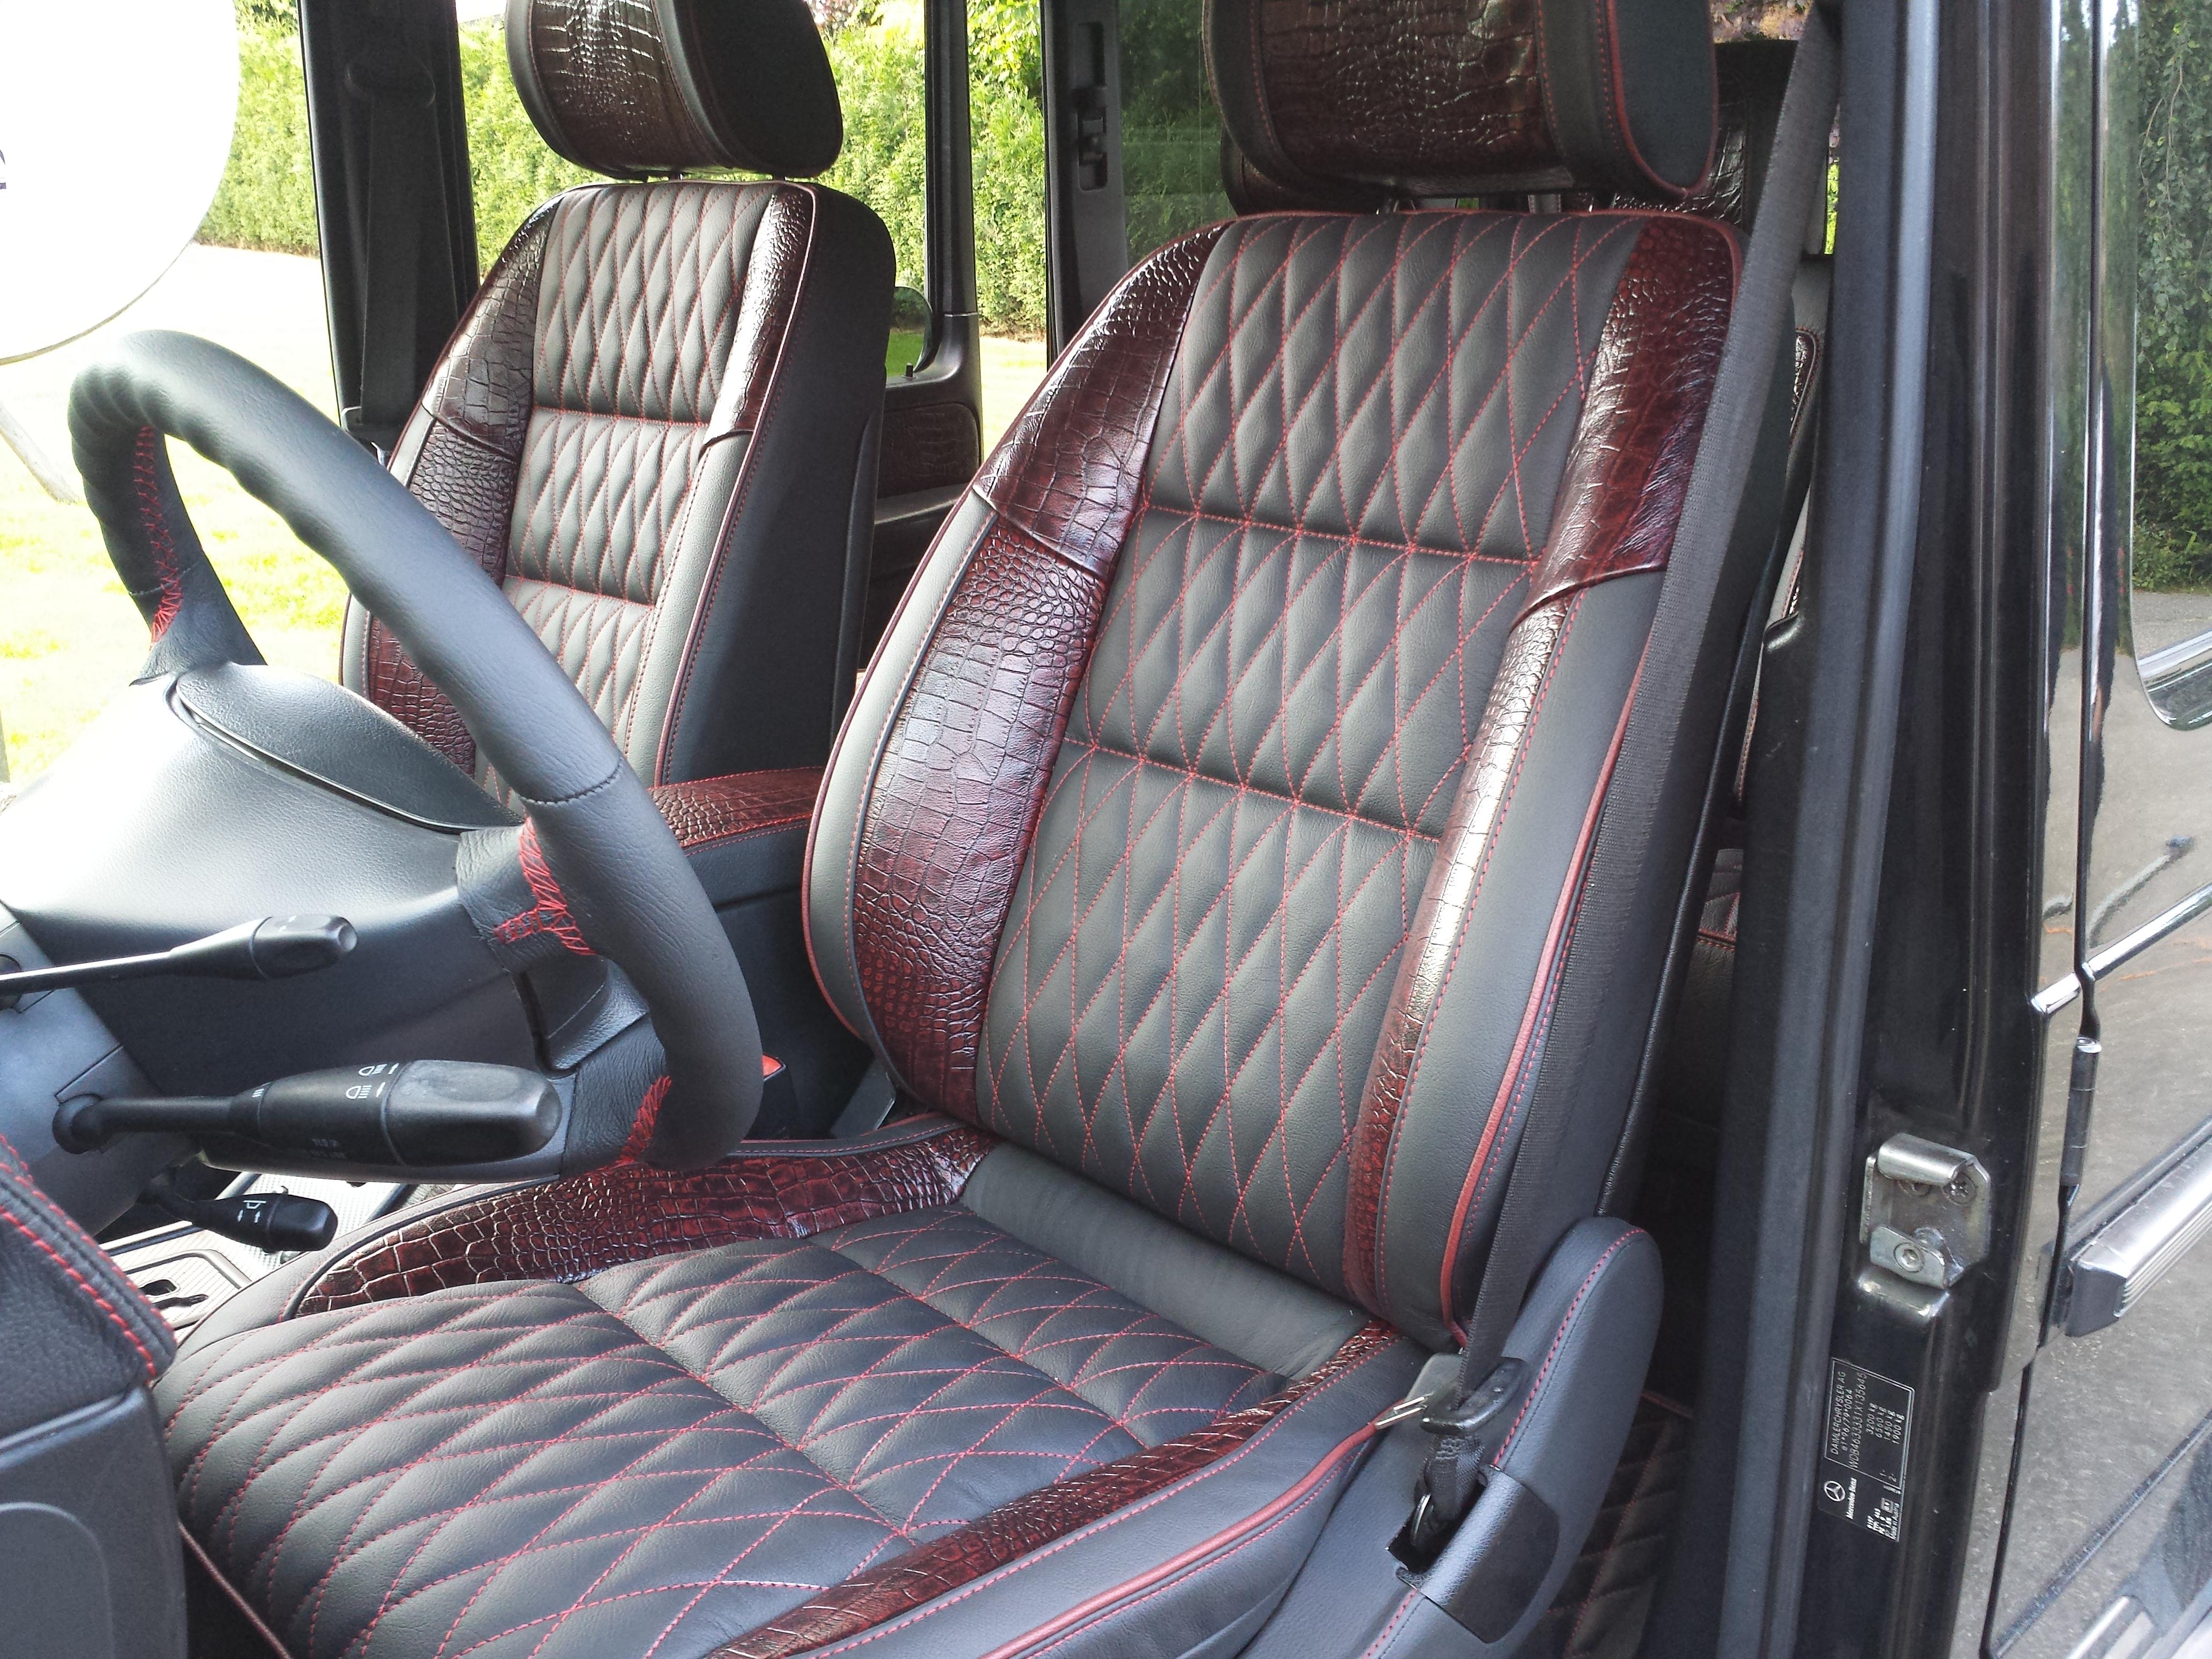 Corba design g wagon r r autobekleding for Auto interieur reparatie